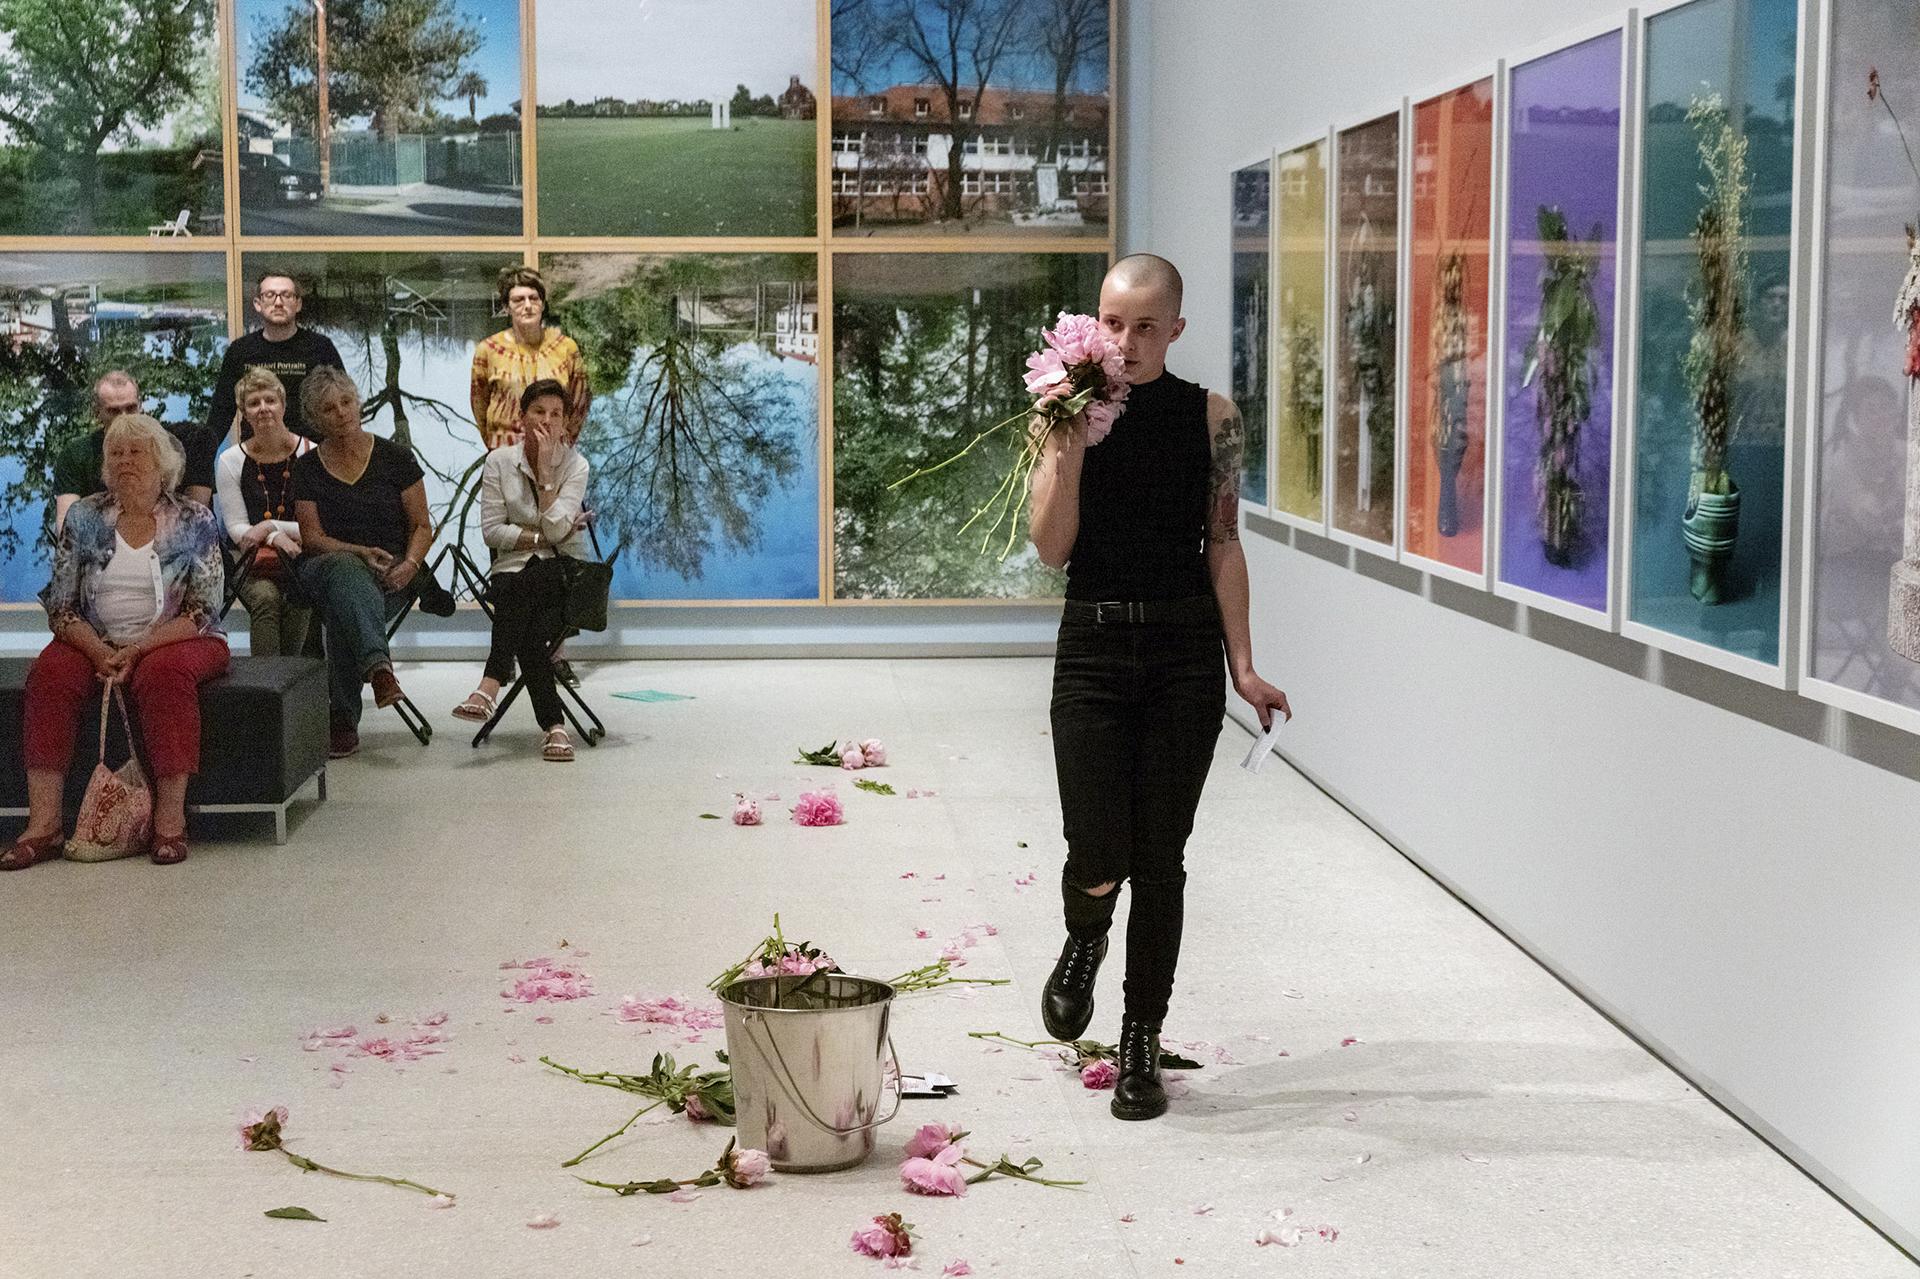 Ann Shelton 3. The physical garden, Auckland Art Gallery ©Ann Sheltonsm1